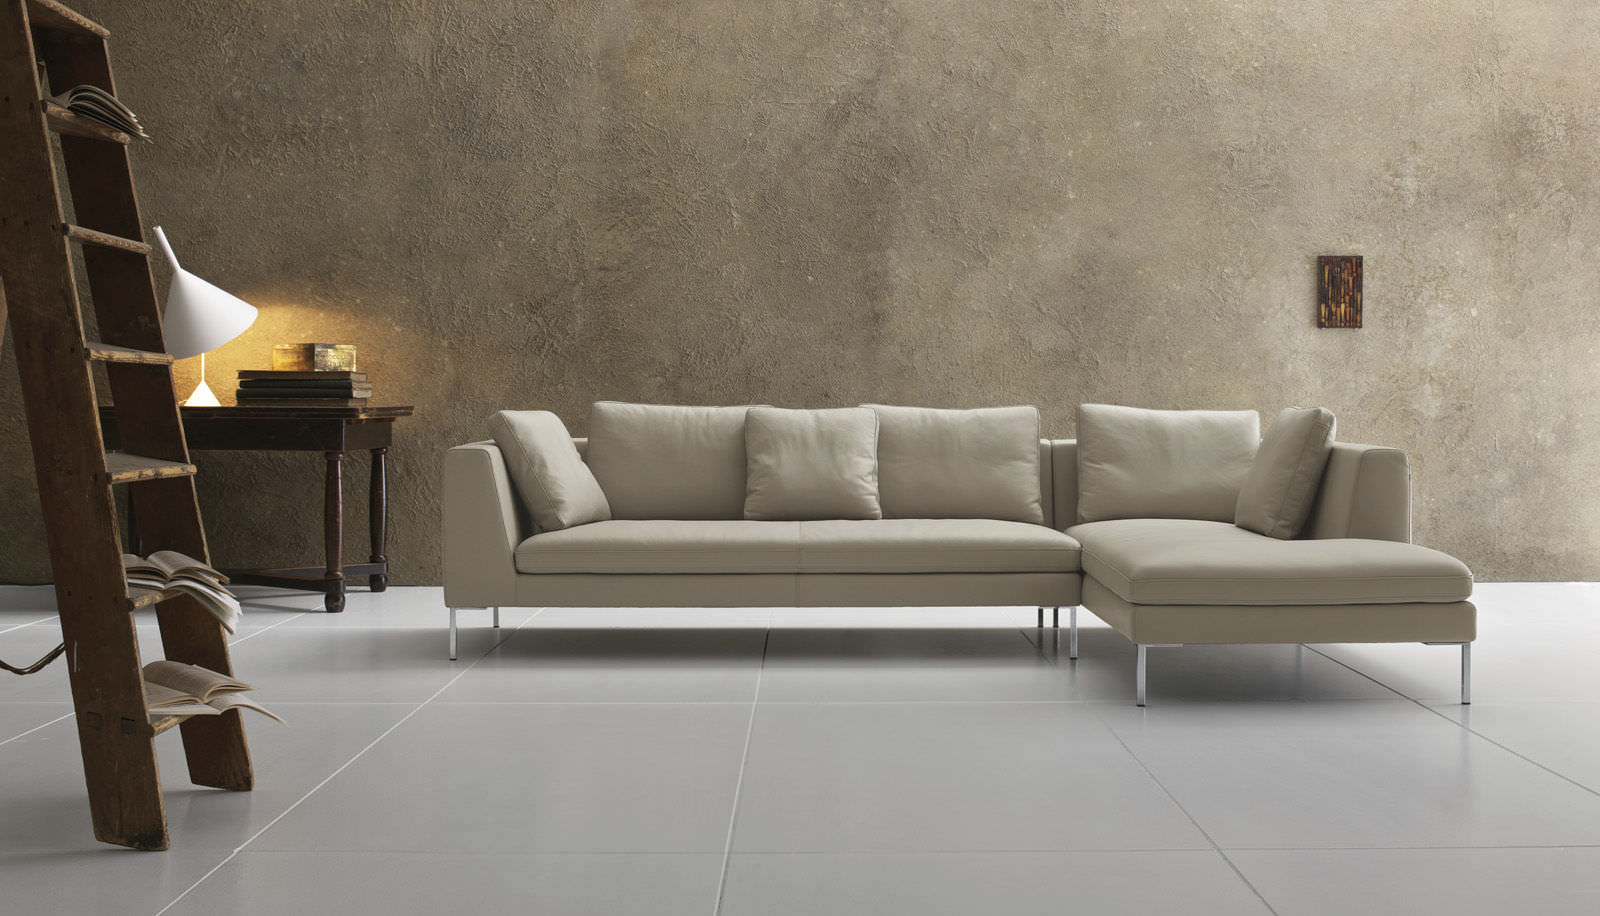 Sofa modern leder  Modulierbares Sofa / modern / Leder / Stoff - LUNA - Alberta